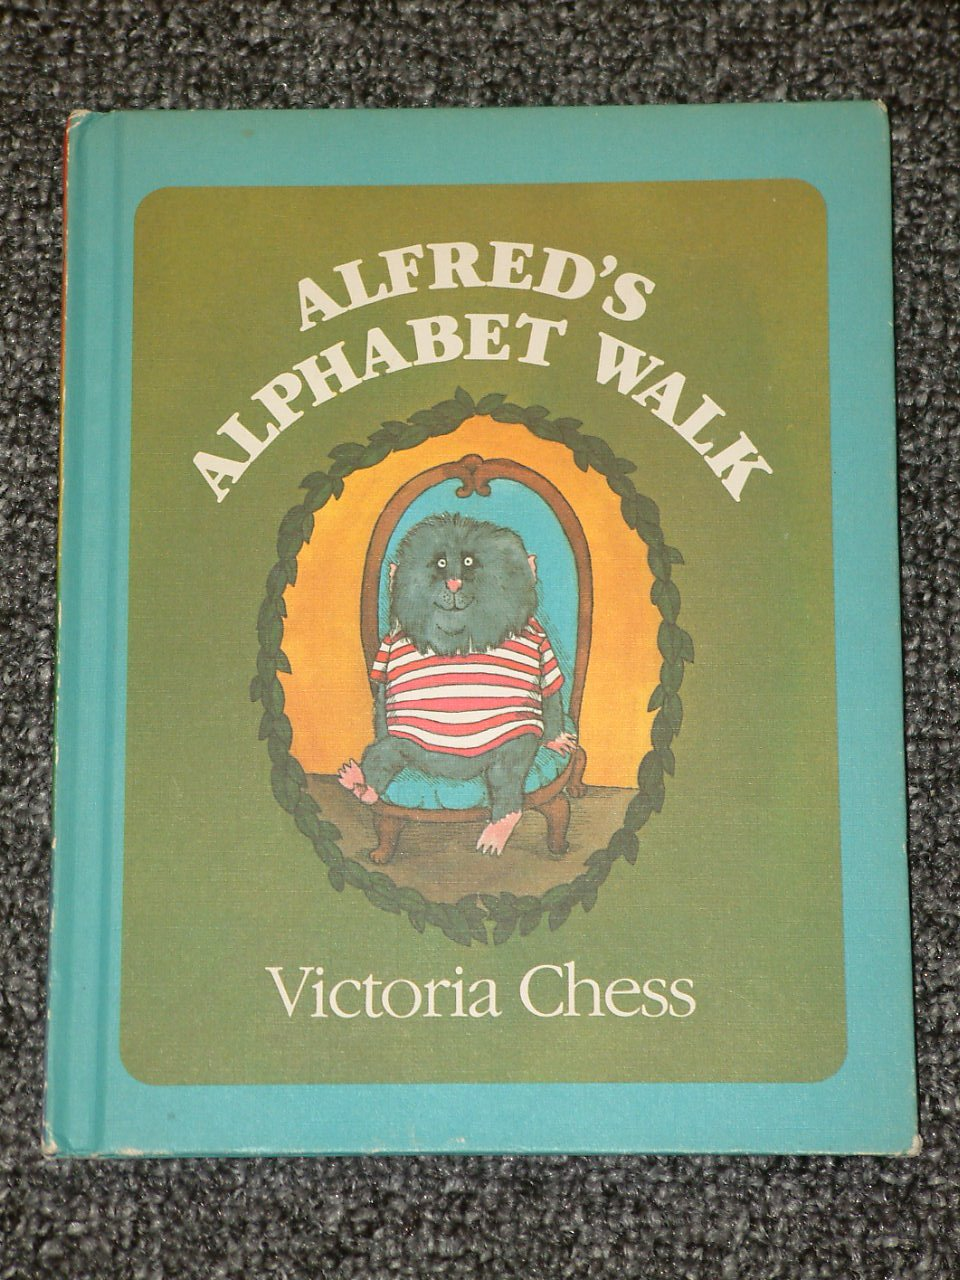 Alfred's Alphabet Walk by Victoria Chess